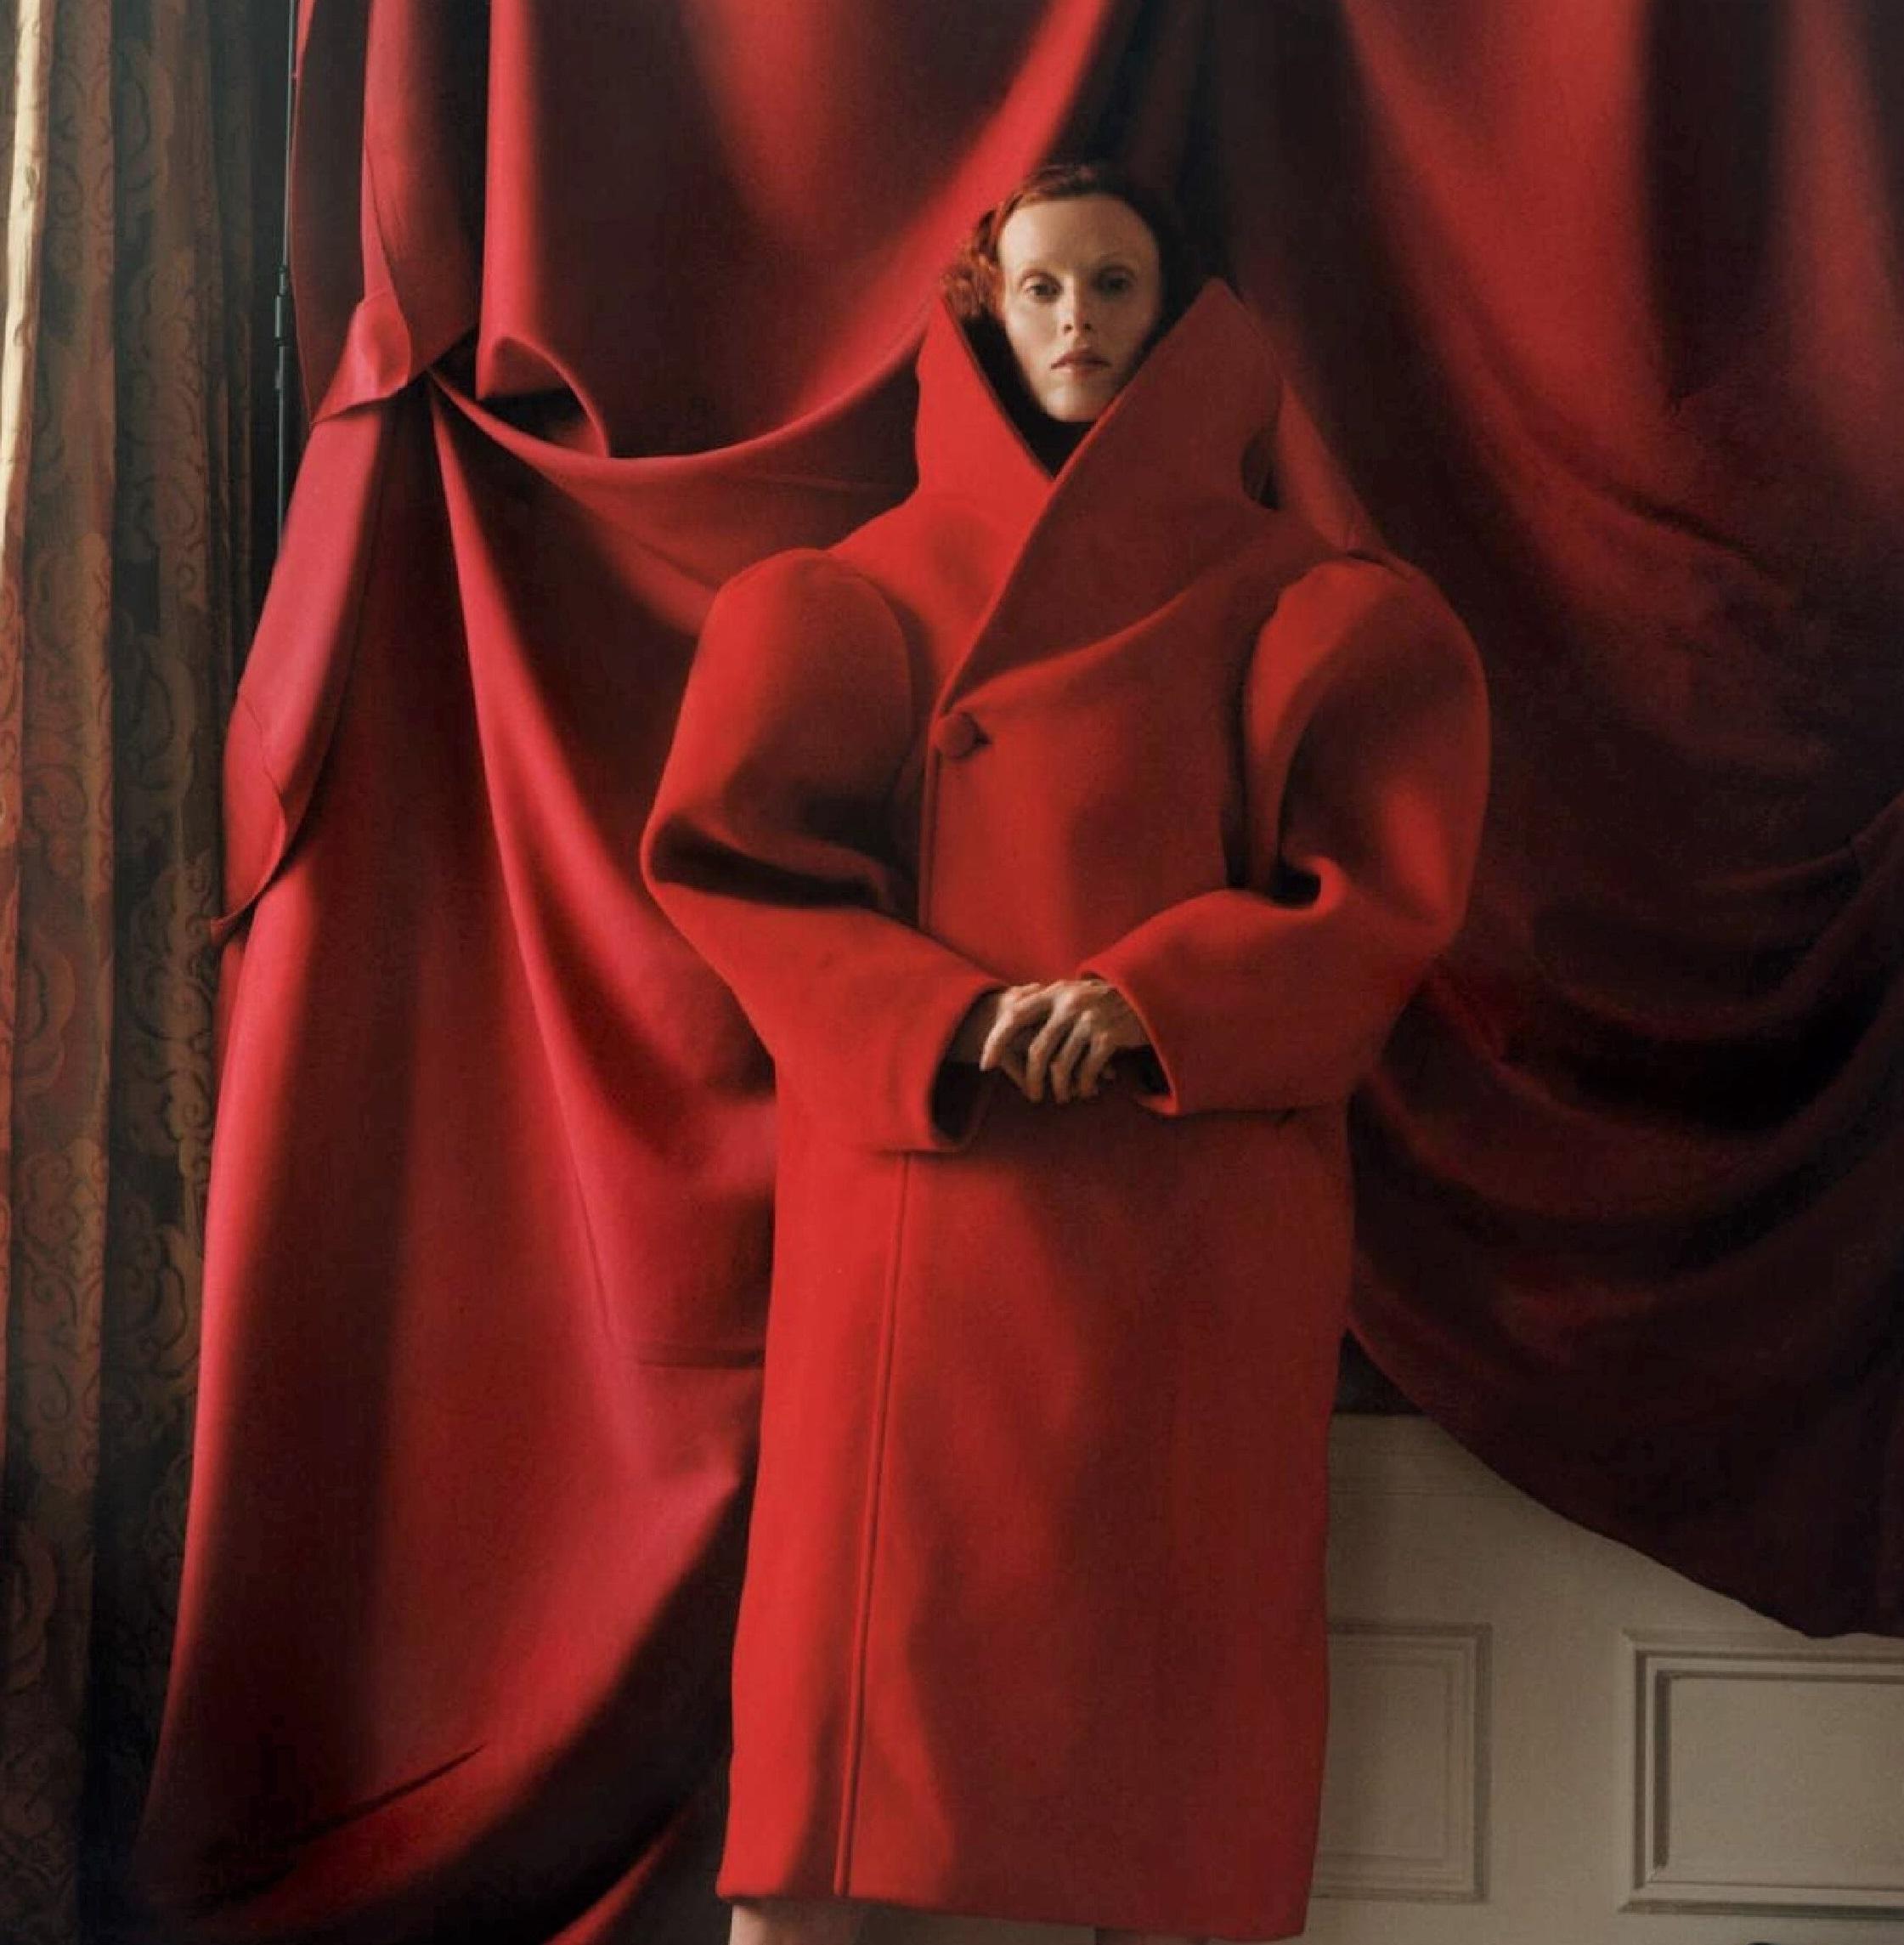 Karen Elson by Alexander Saladrigas for Vogue Russia Sept 2019 (6).jpg